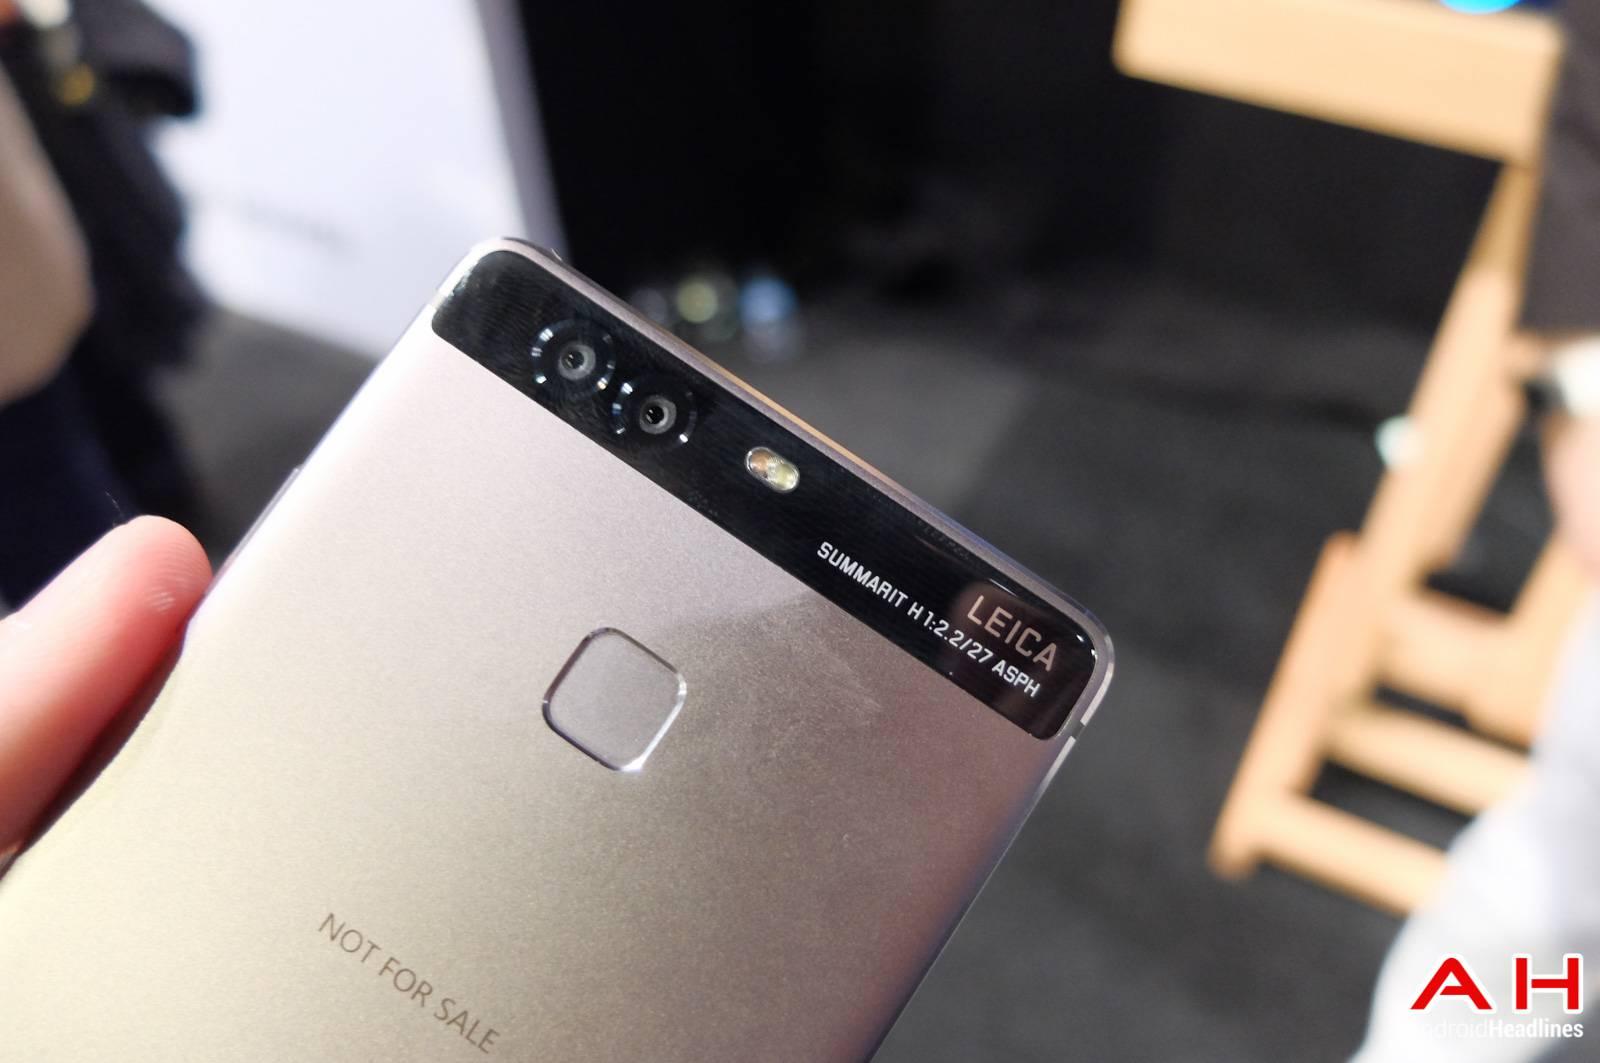 Huawei P9 Plus AH 0528